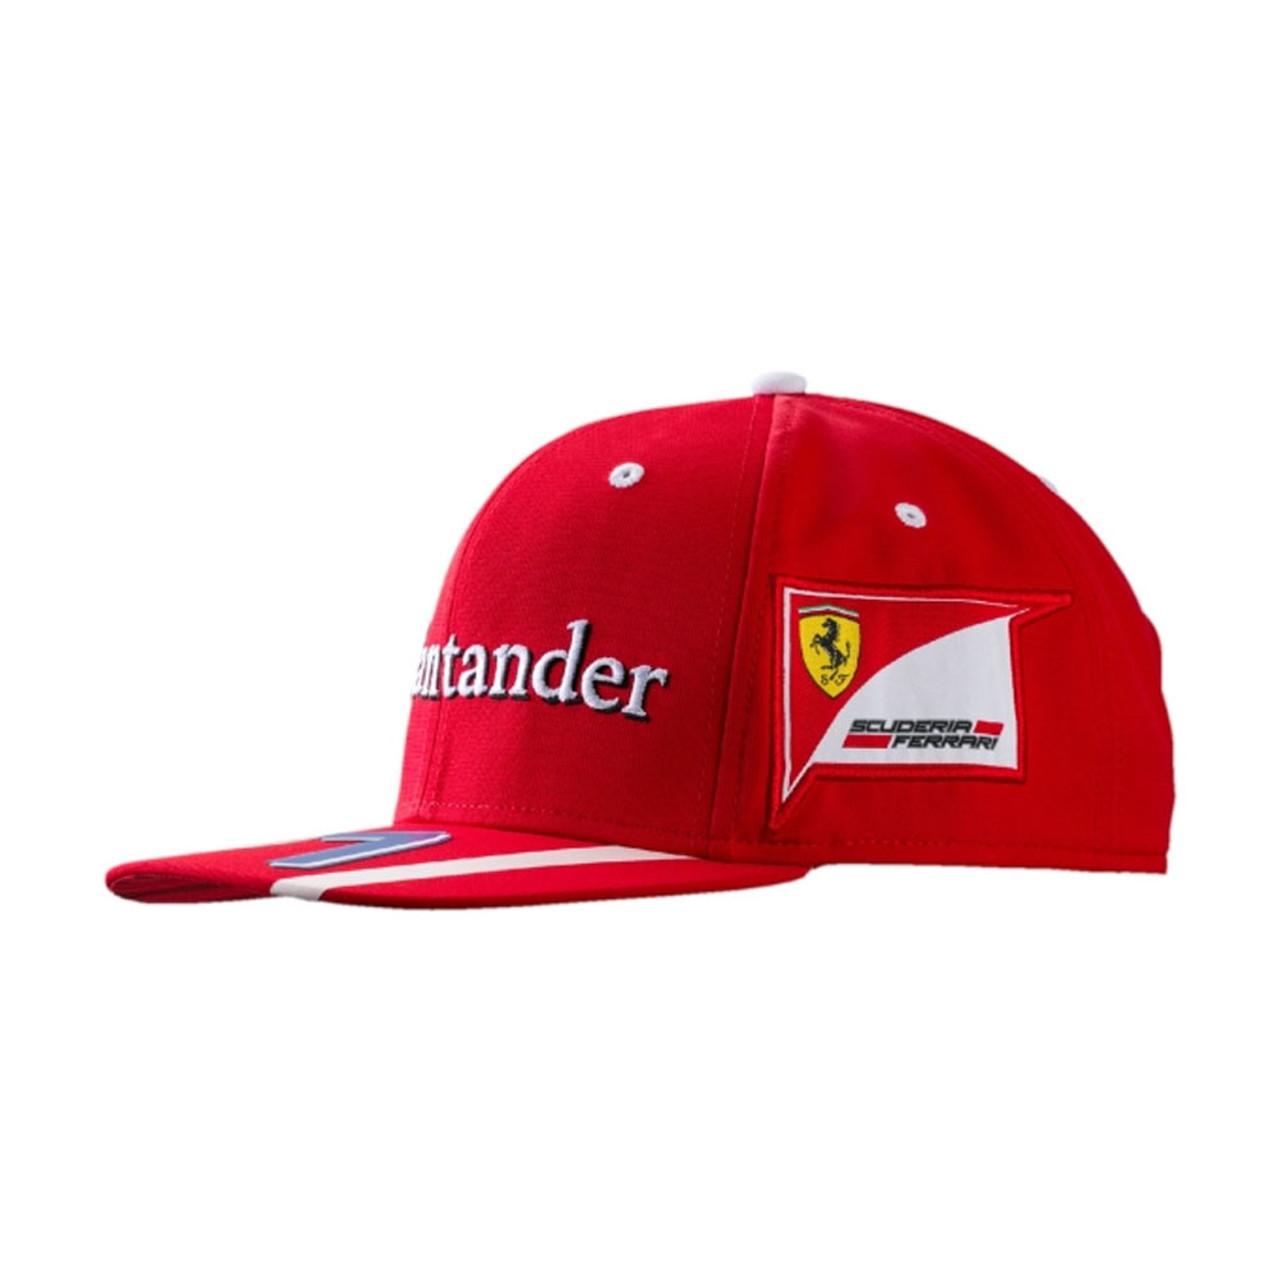 PUMA Ferrari replica raikkonen cap rosso  red  5544a43339f7